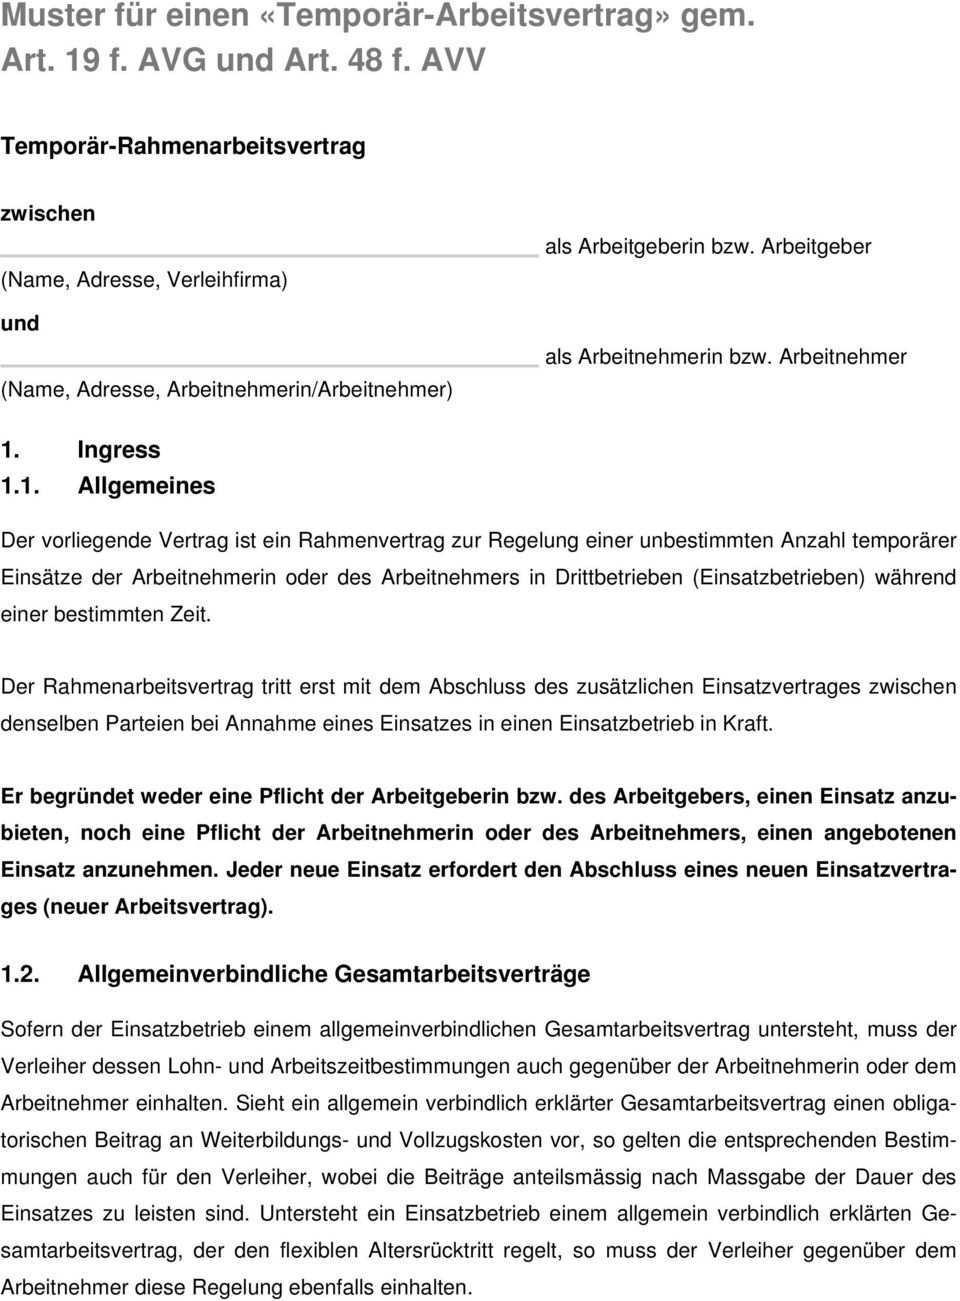 Muster Fur Einen Temporar Arbeitsvertrag Gem Art 19 F Avg Und Art 48 F Avv Pdf Kostenfreier Download